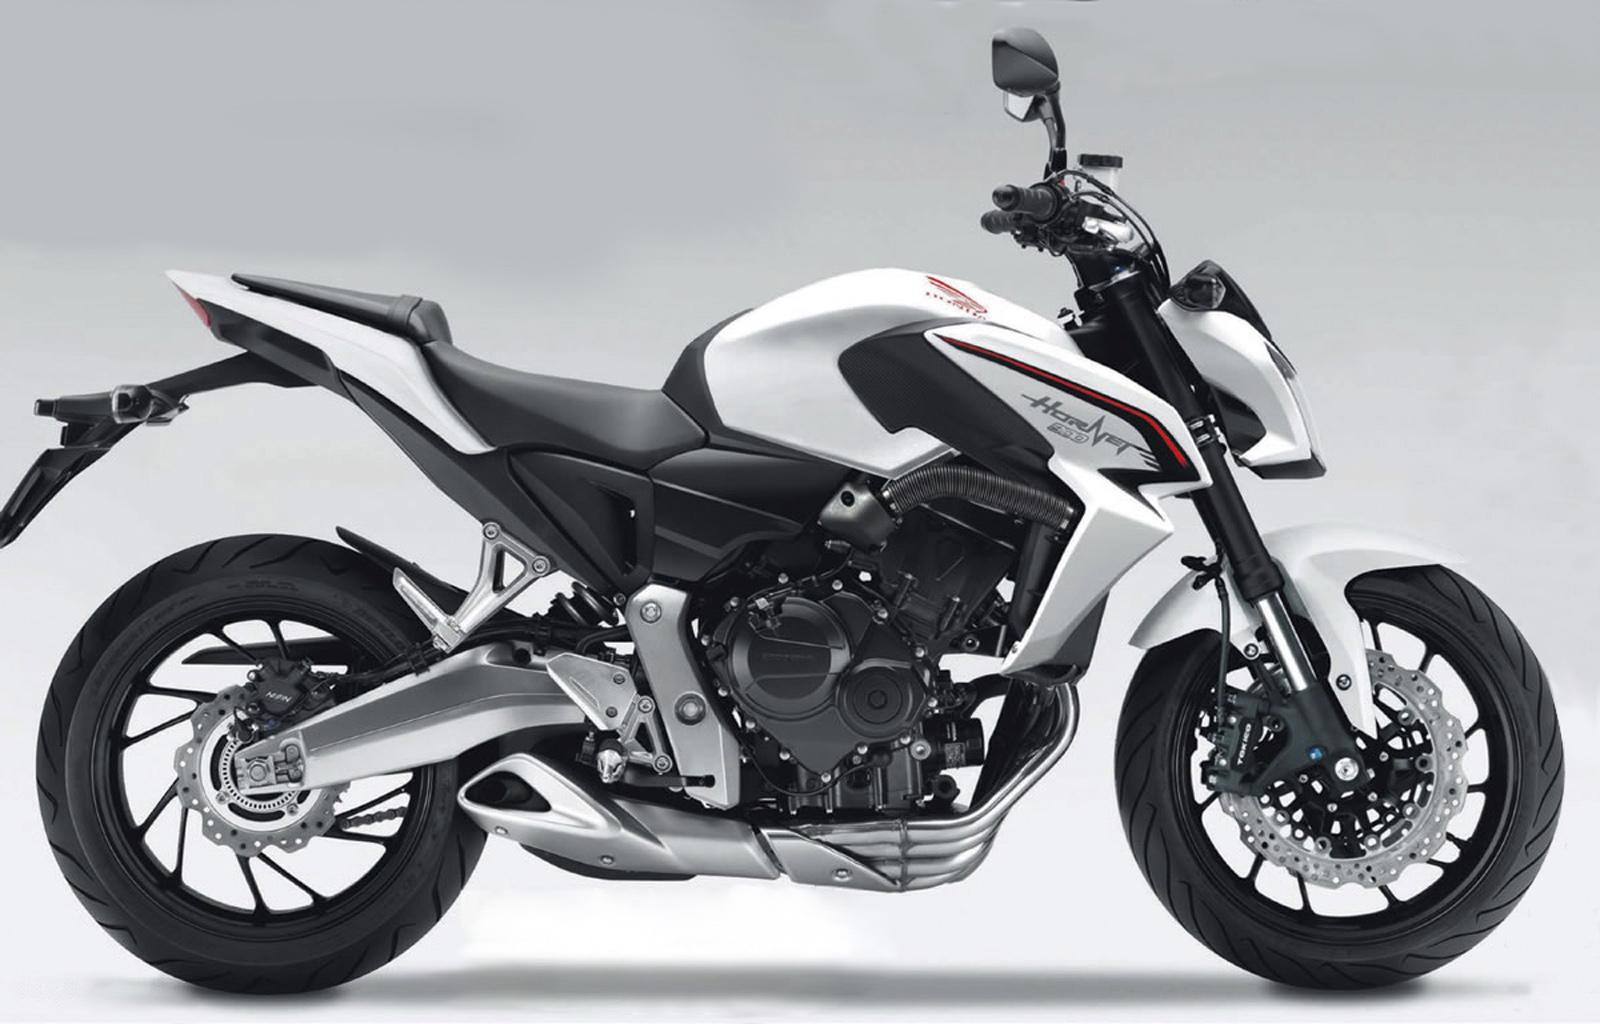 honda hornet arriva la nuova moto nel 2015. Black Bedroom Furniture Sets. Home Design Ideas